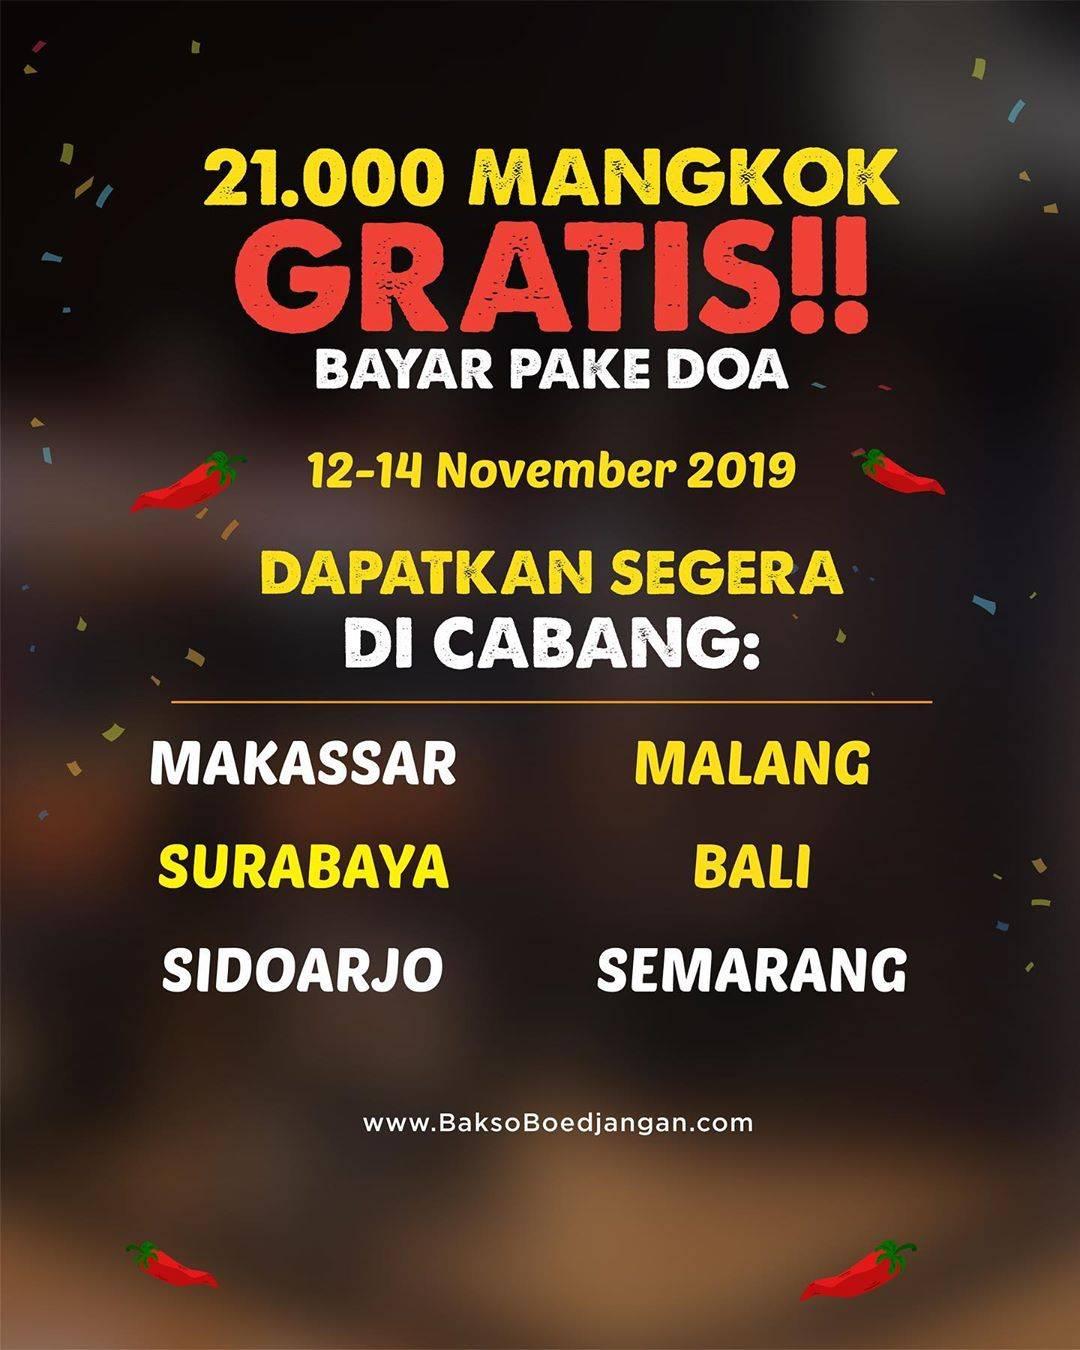 Promo diskon Bakso Boedjangan Promo Gratis 21.000 Mangkok Bakso ACI Boedjangan